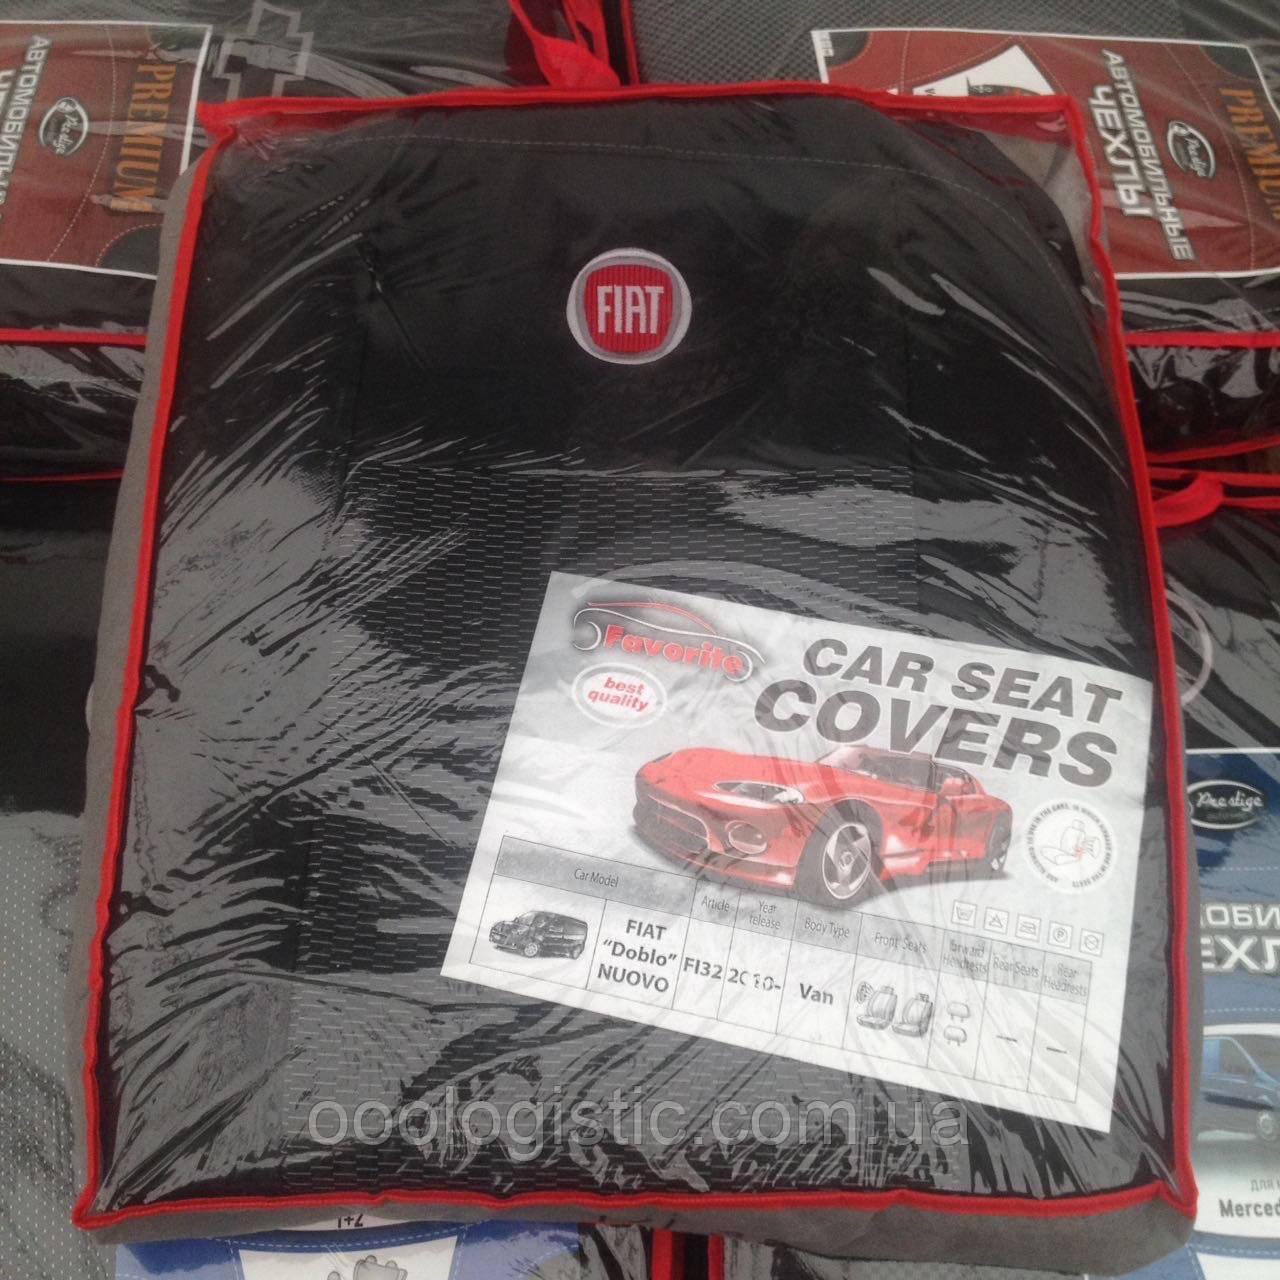 Авточехлы Favorite на Fiat Doblo Nuovo 1+1 2010> van,Фиат Добло Нуово